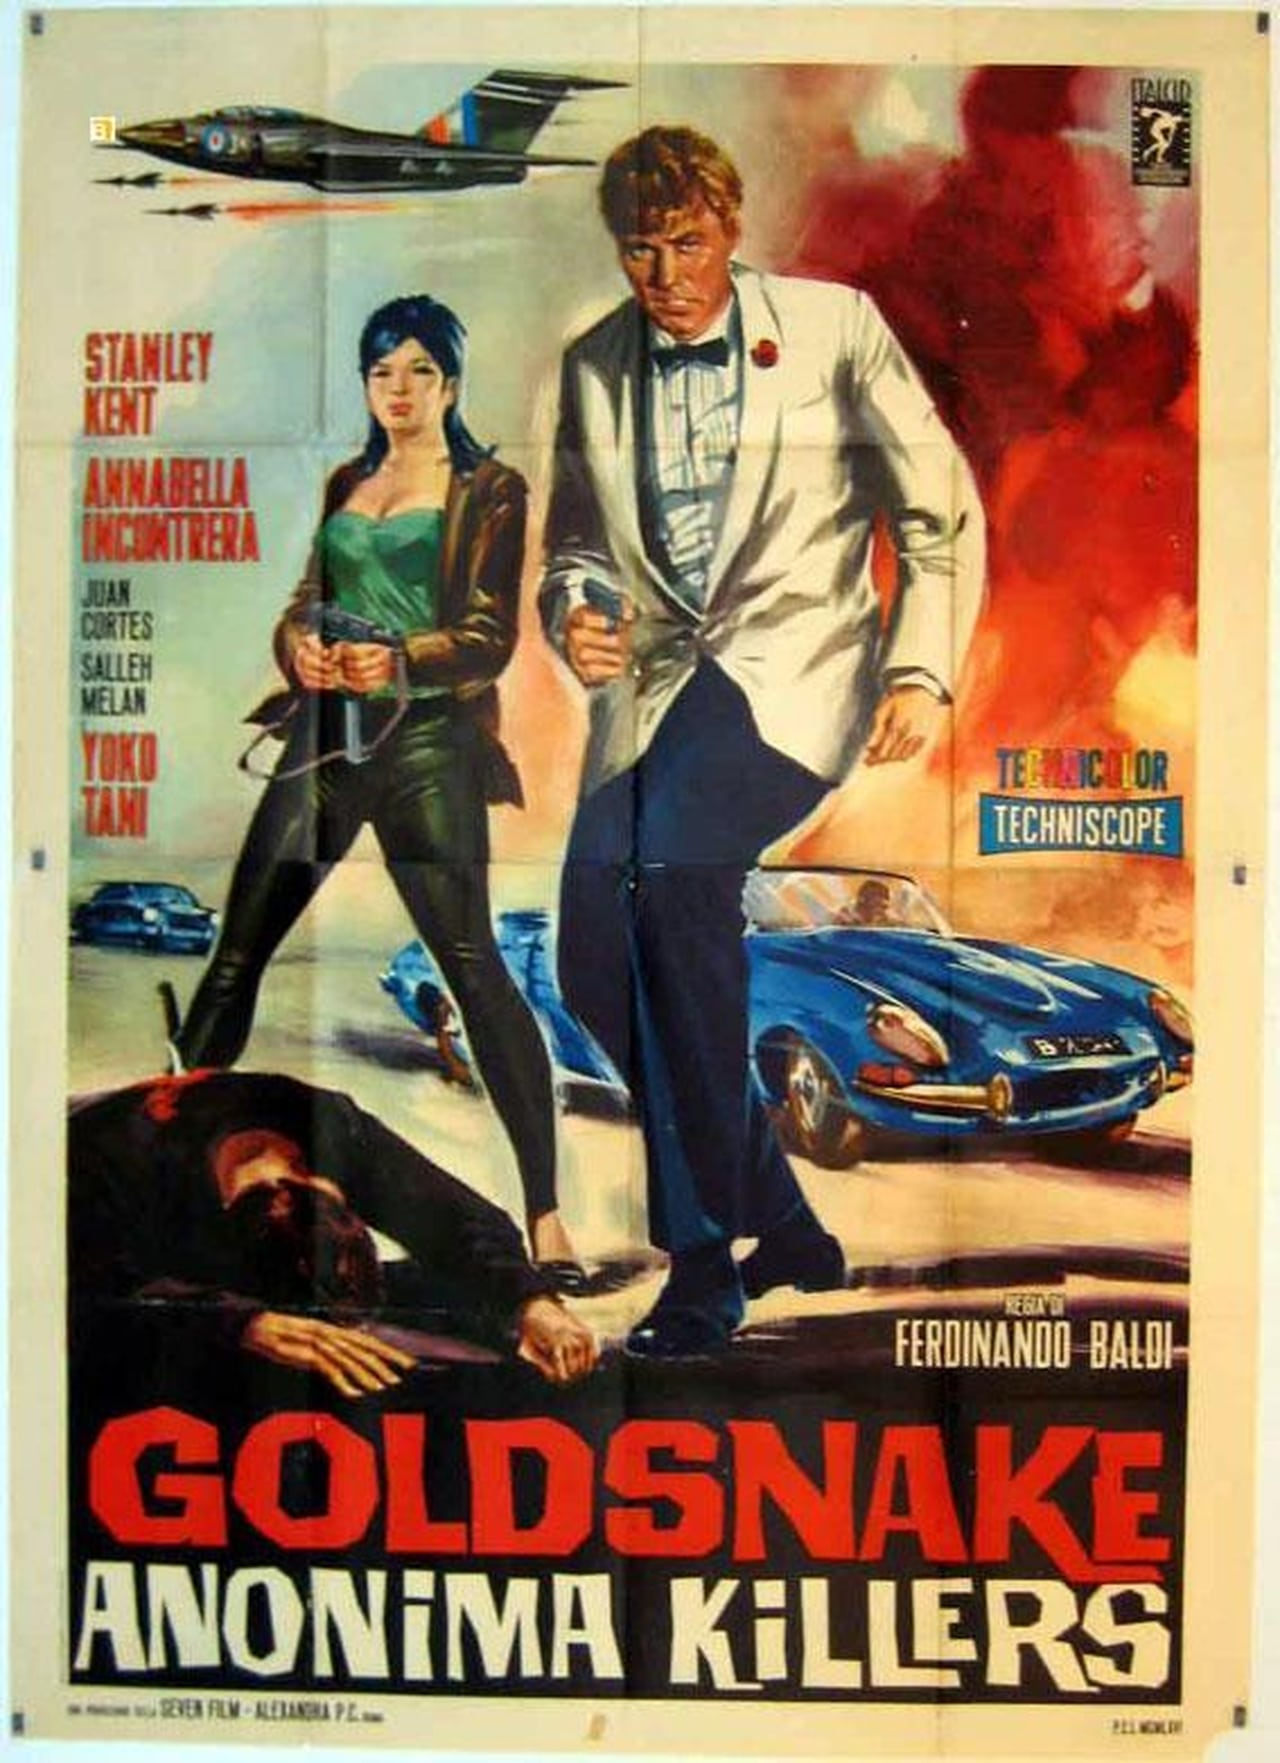 Goldsnake: Anonima killers